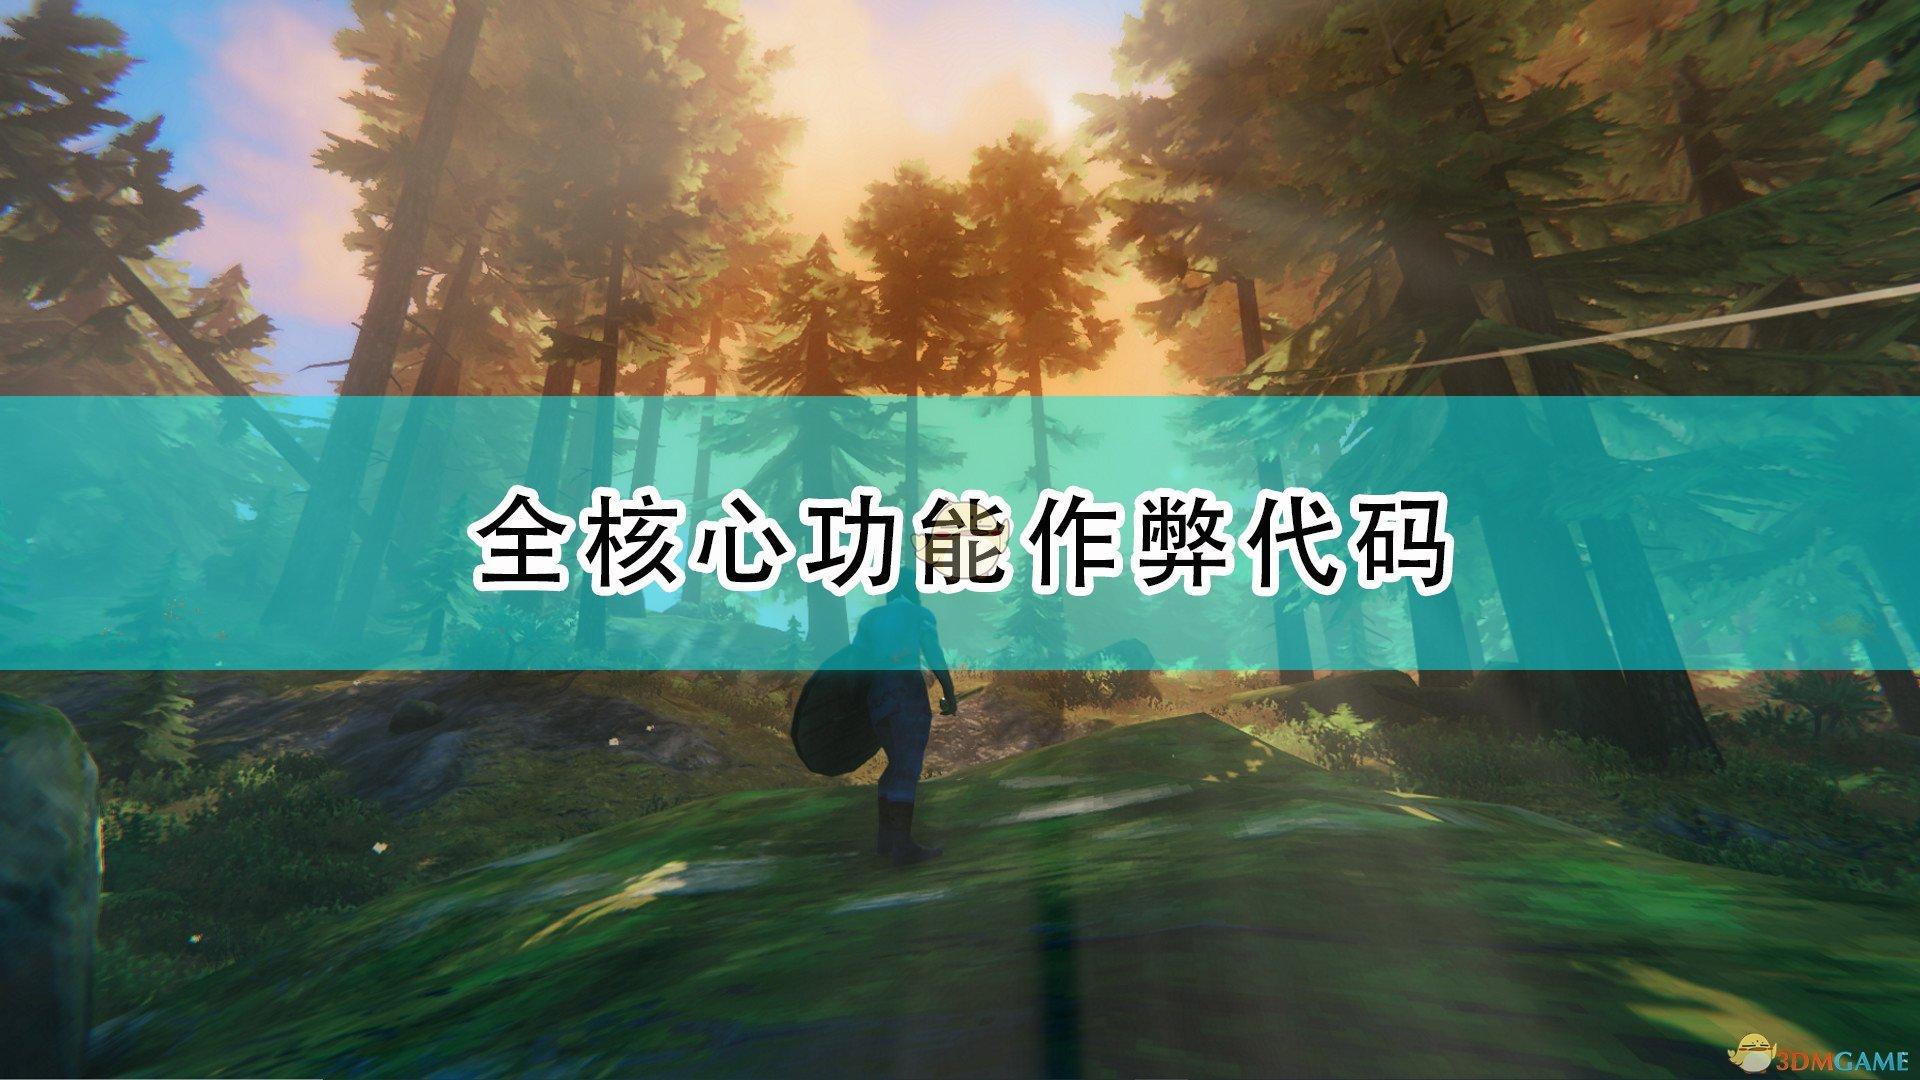 《Valheim:英灵神殿》全核心功能作弊代码一览